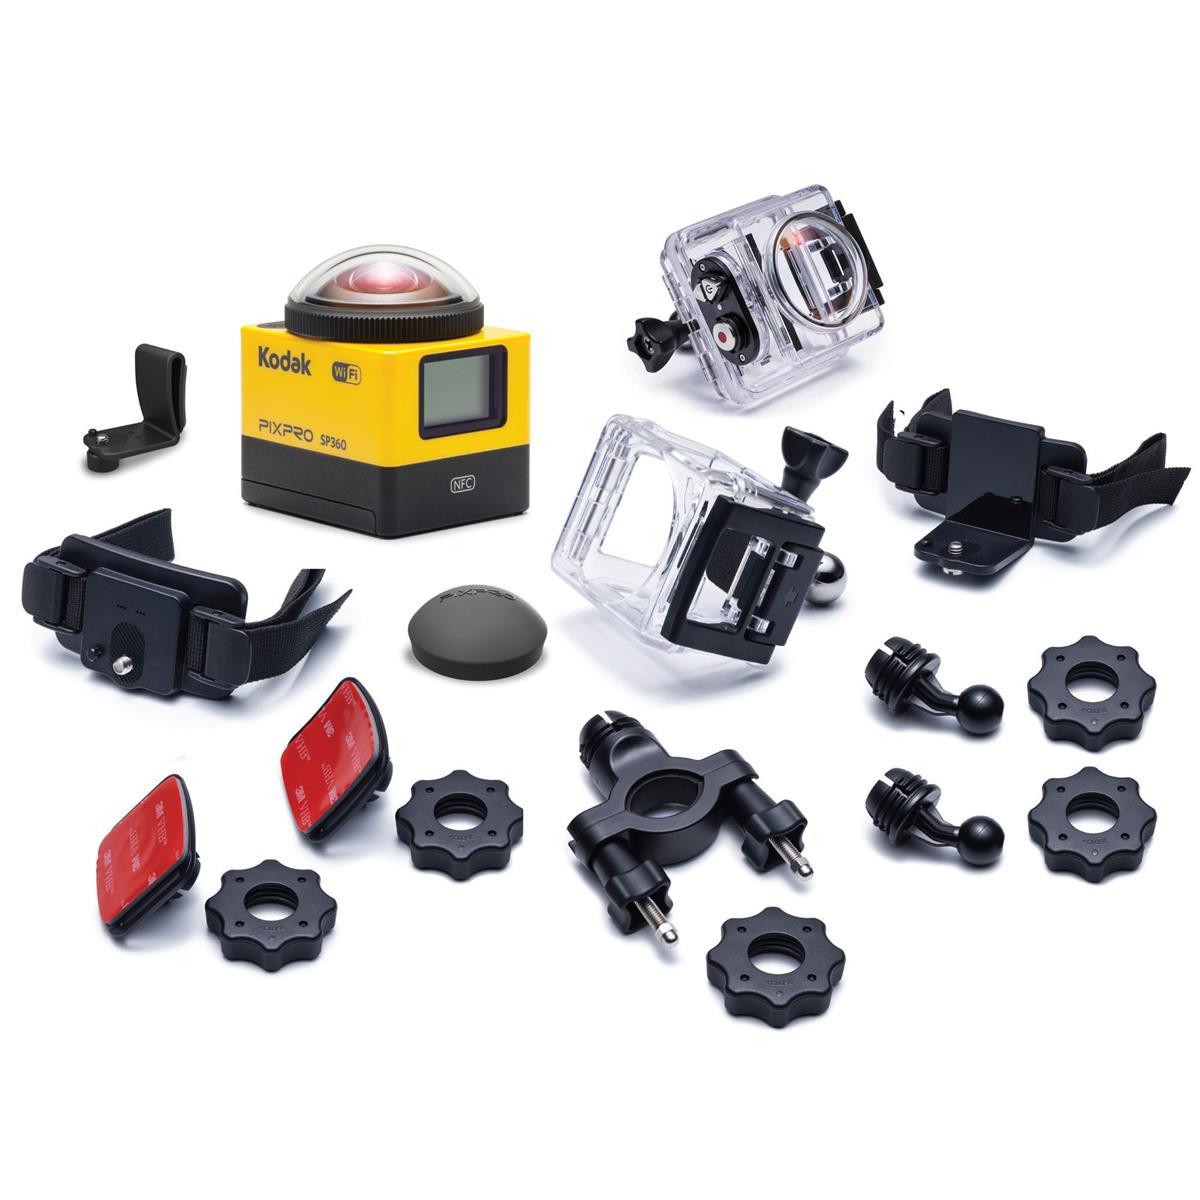 Kodak PIXPRO SP360 360 Degree VR Action Camera with Explorer Pack & Waterproof Housing Case $65 + free s/h